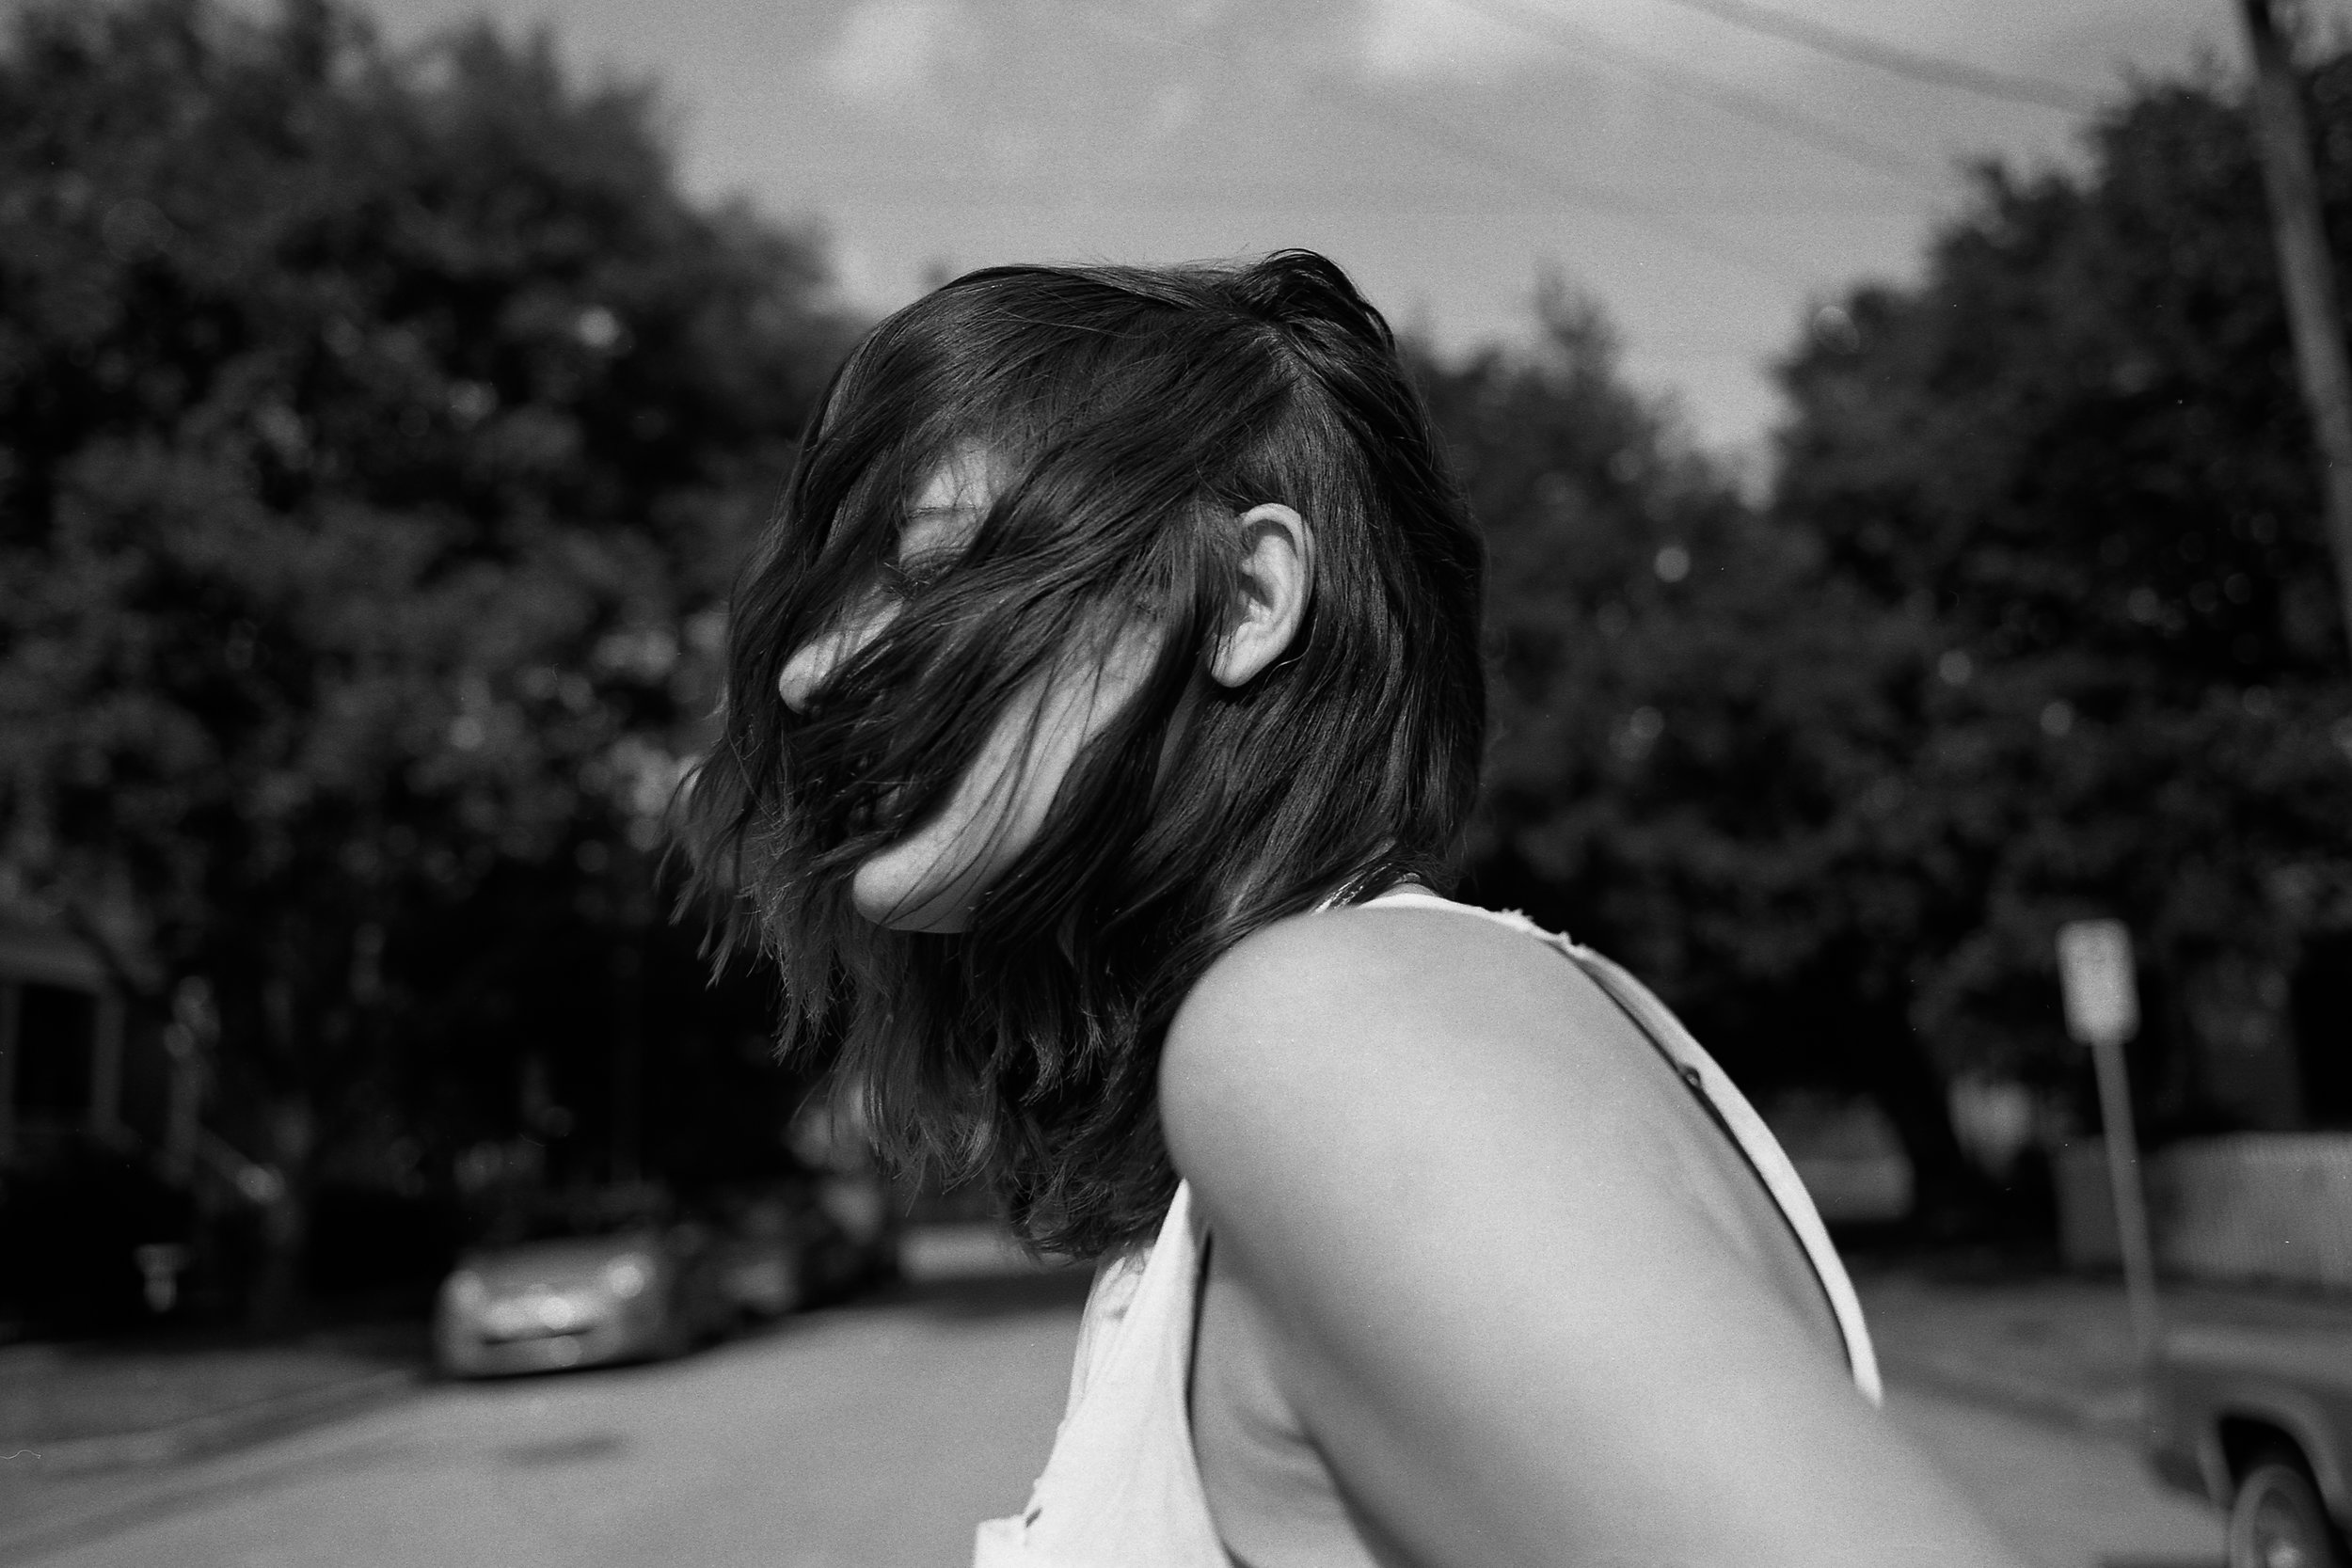 Melissa Laree Cunningham